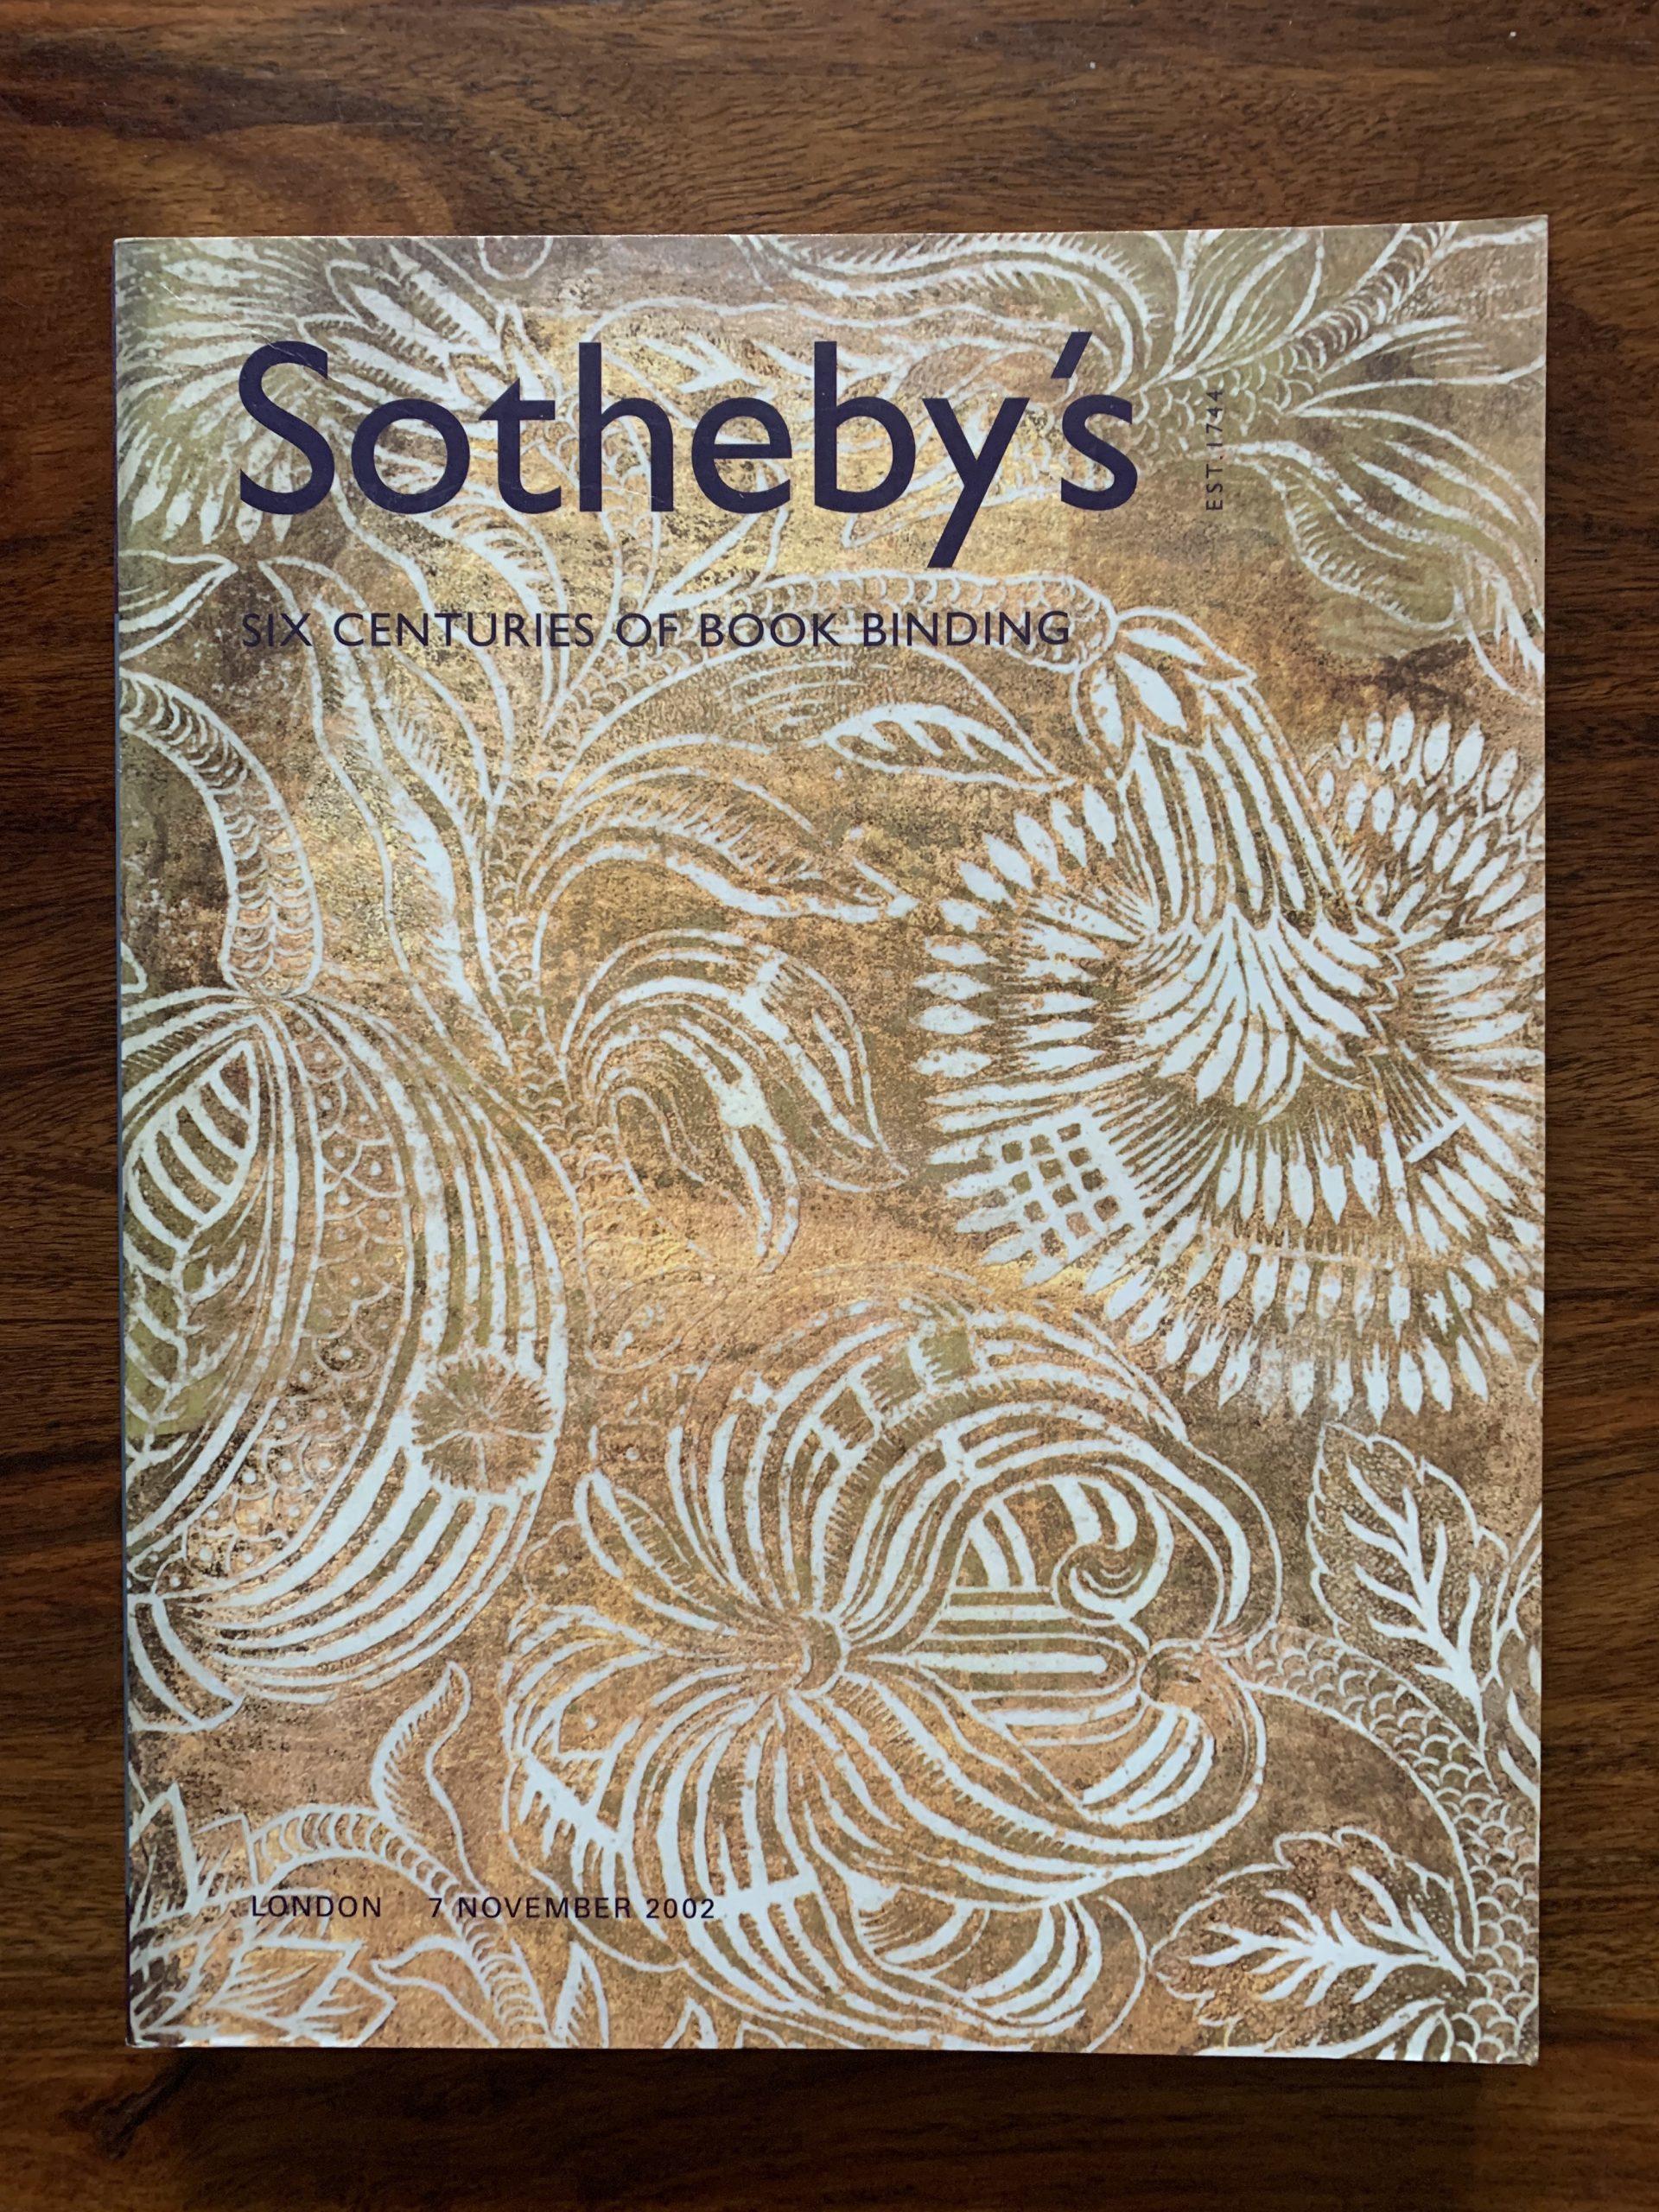 Sotheby's. Six Centuries Of Book Binding.